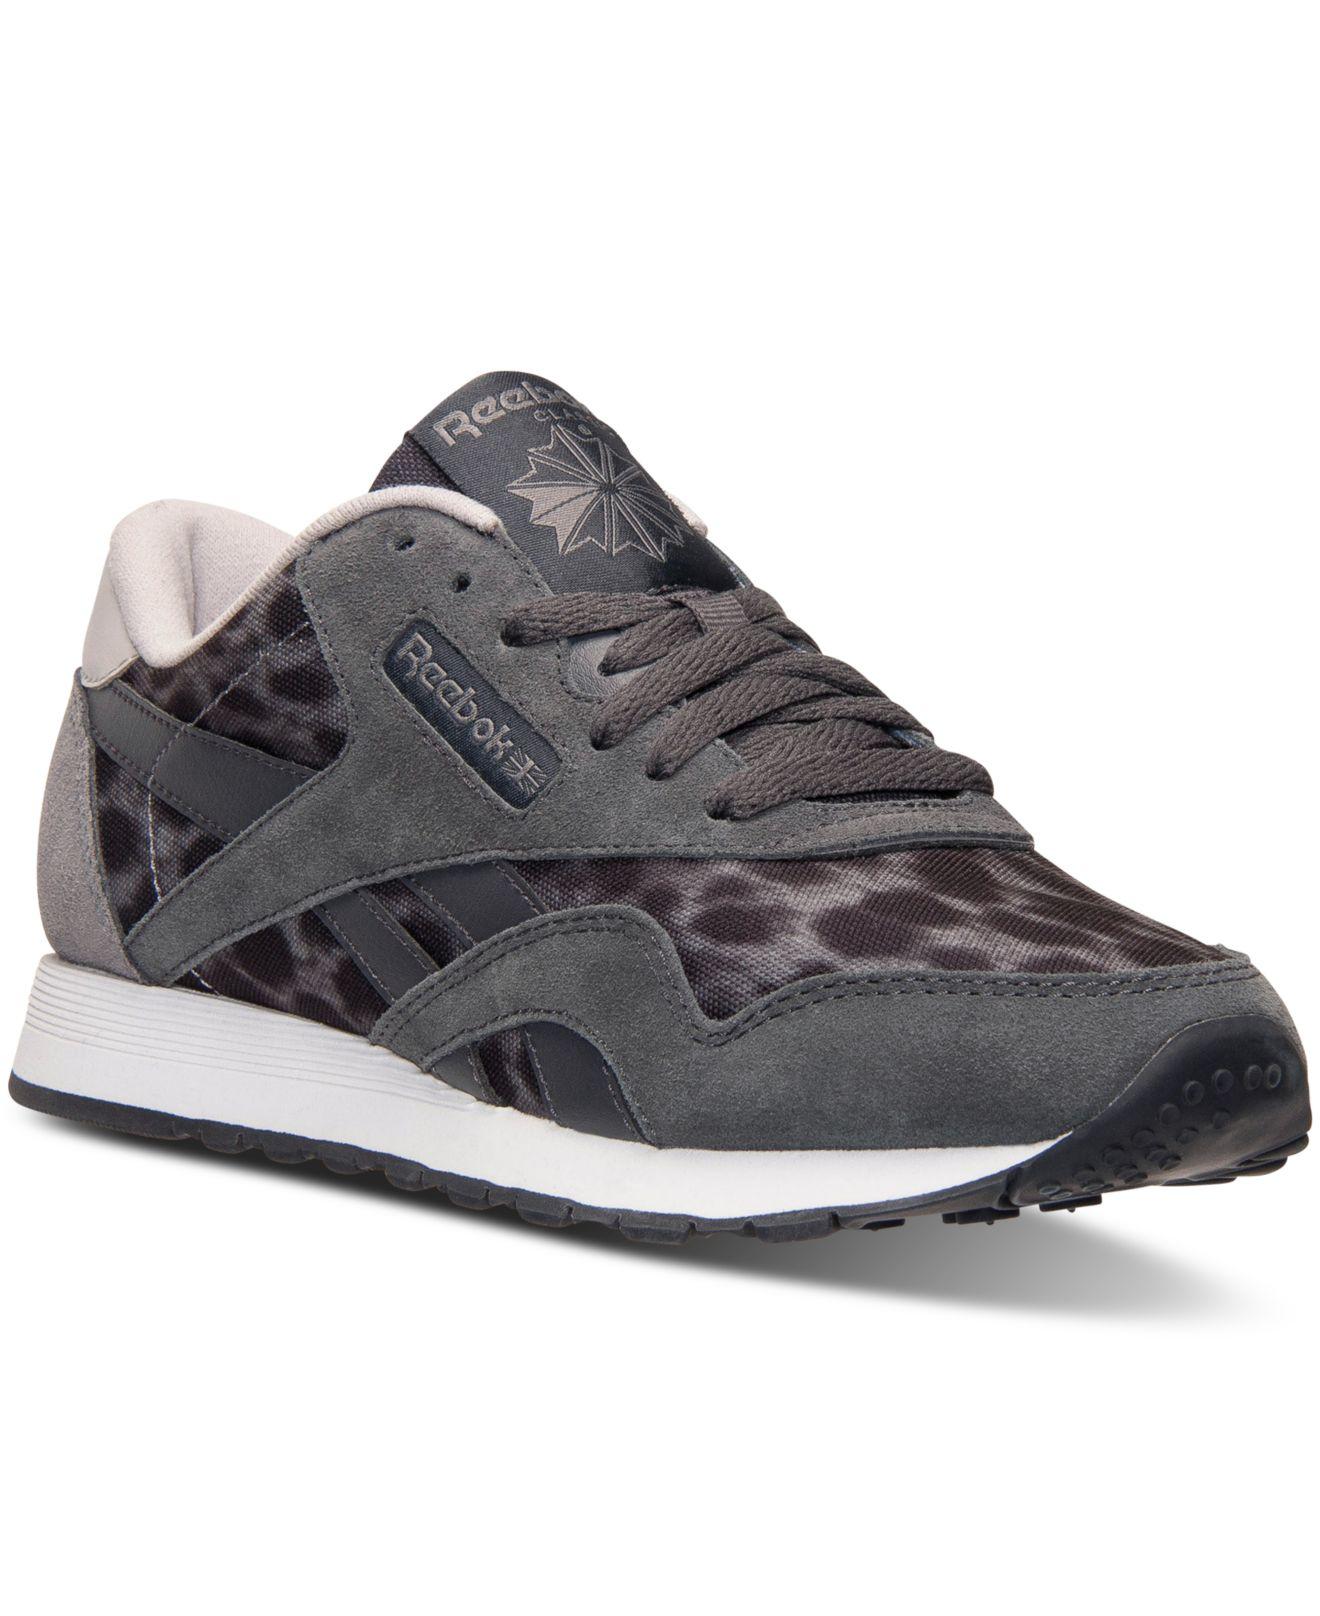 promo code 84540 66ea5 Reebok Women s Classic Nylon Wild Casual Sneakers From Finish Line ...